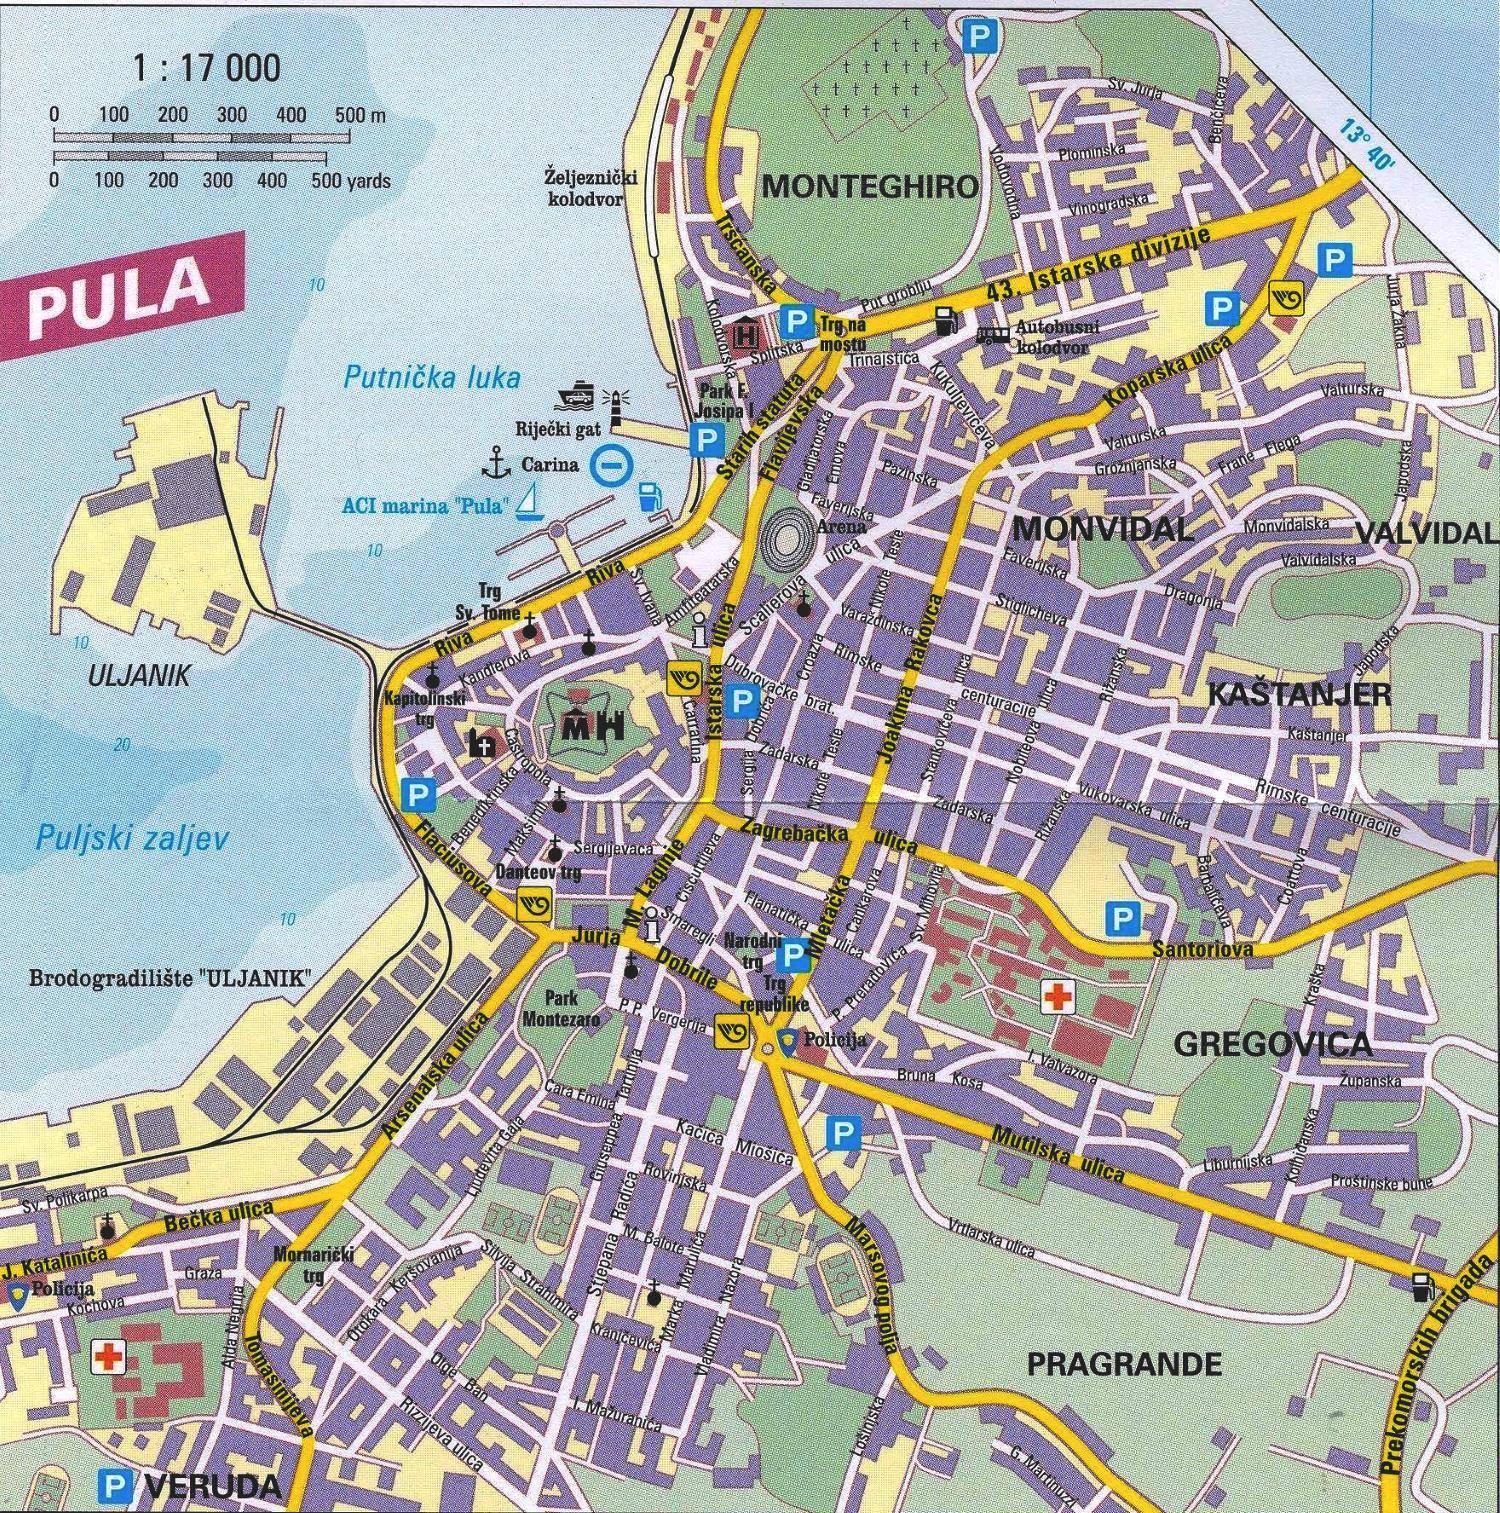 Italia Croazia Cartina.Mappa Pola Cartina Di Pola